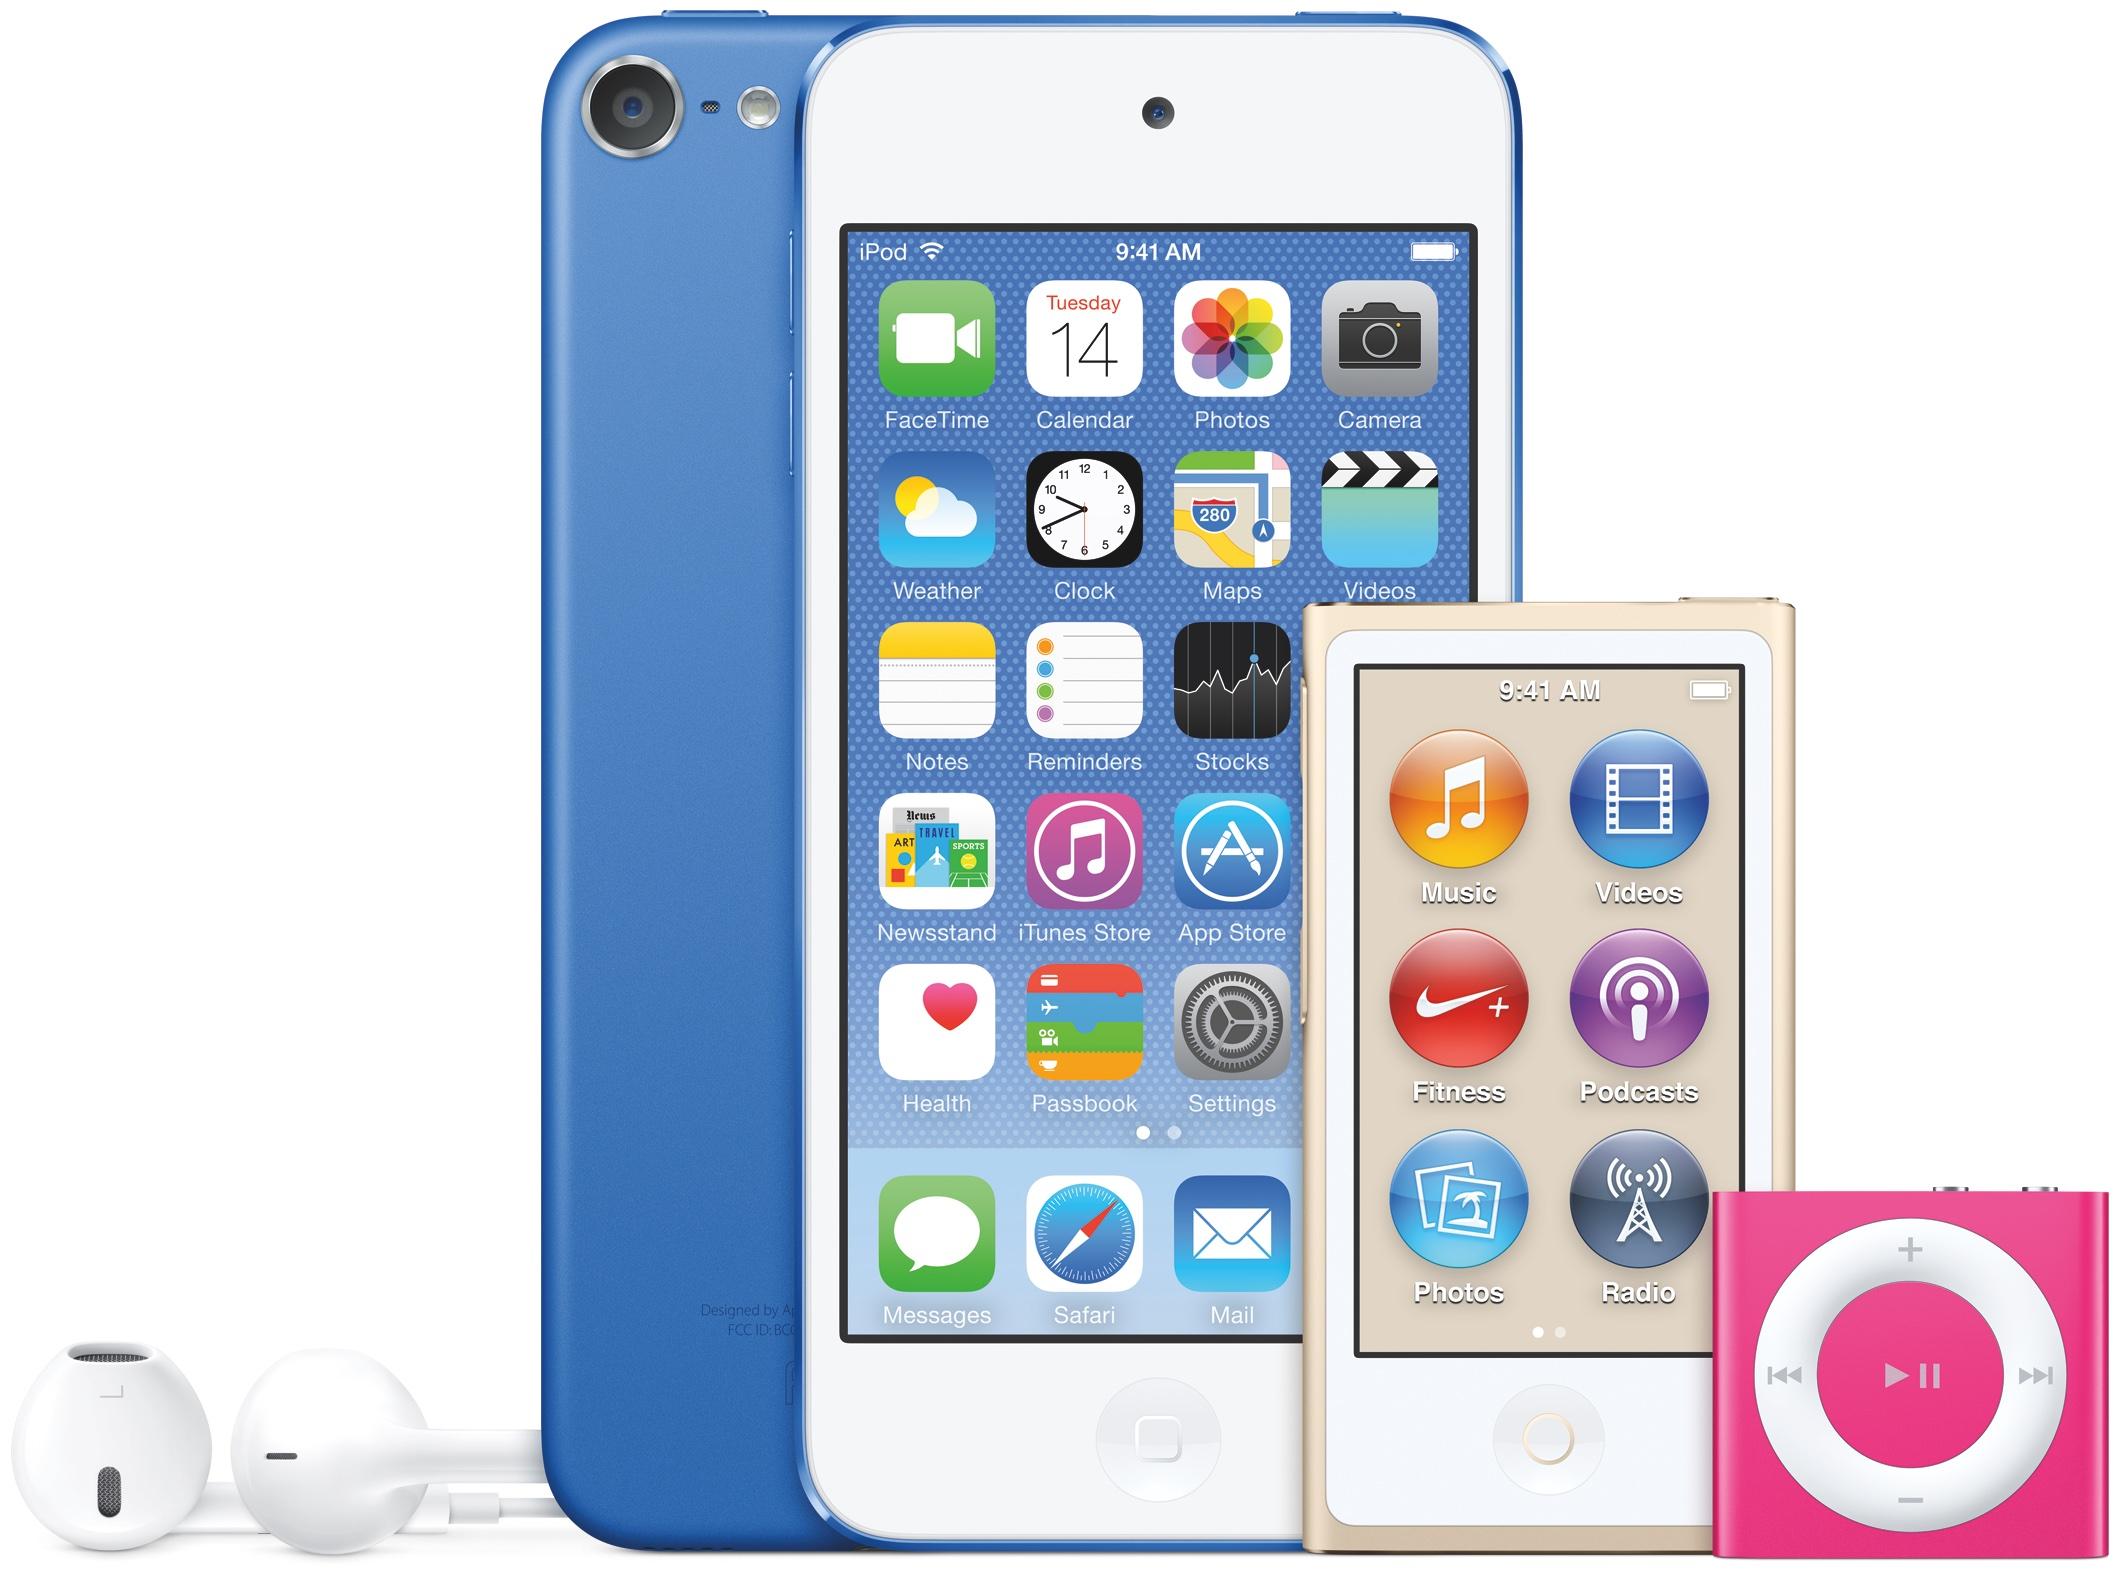 iPod family mid-2015 image 001